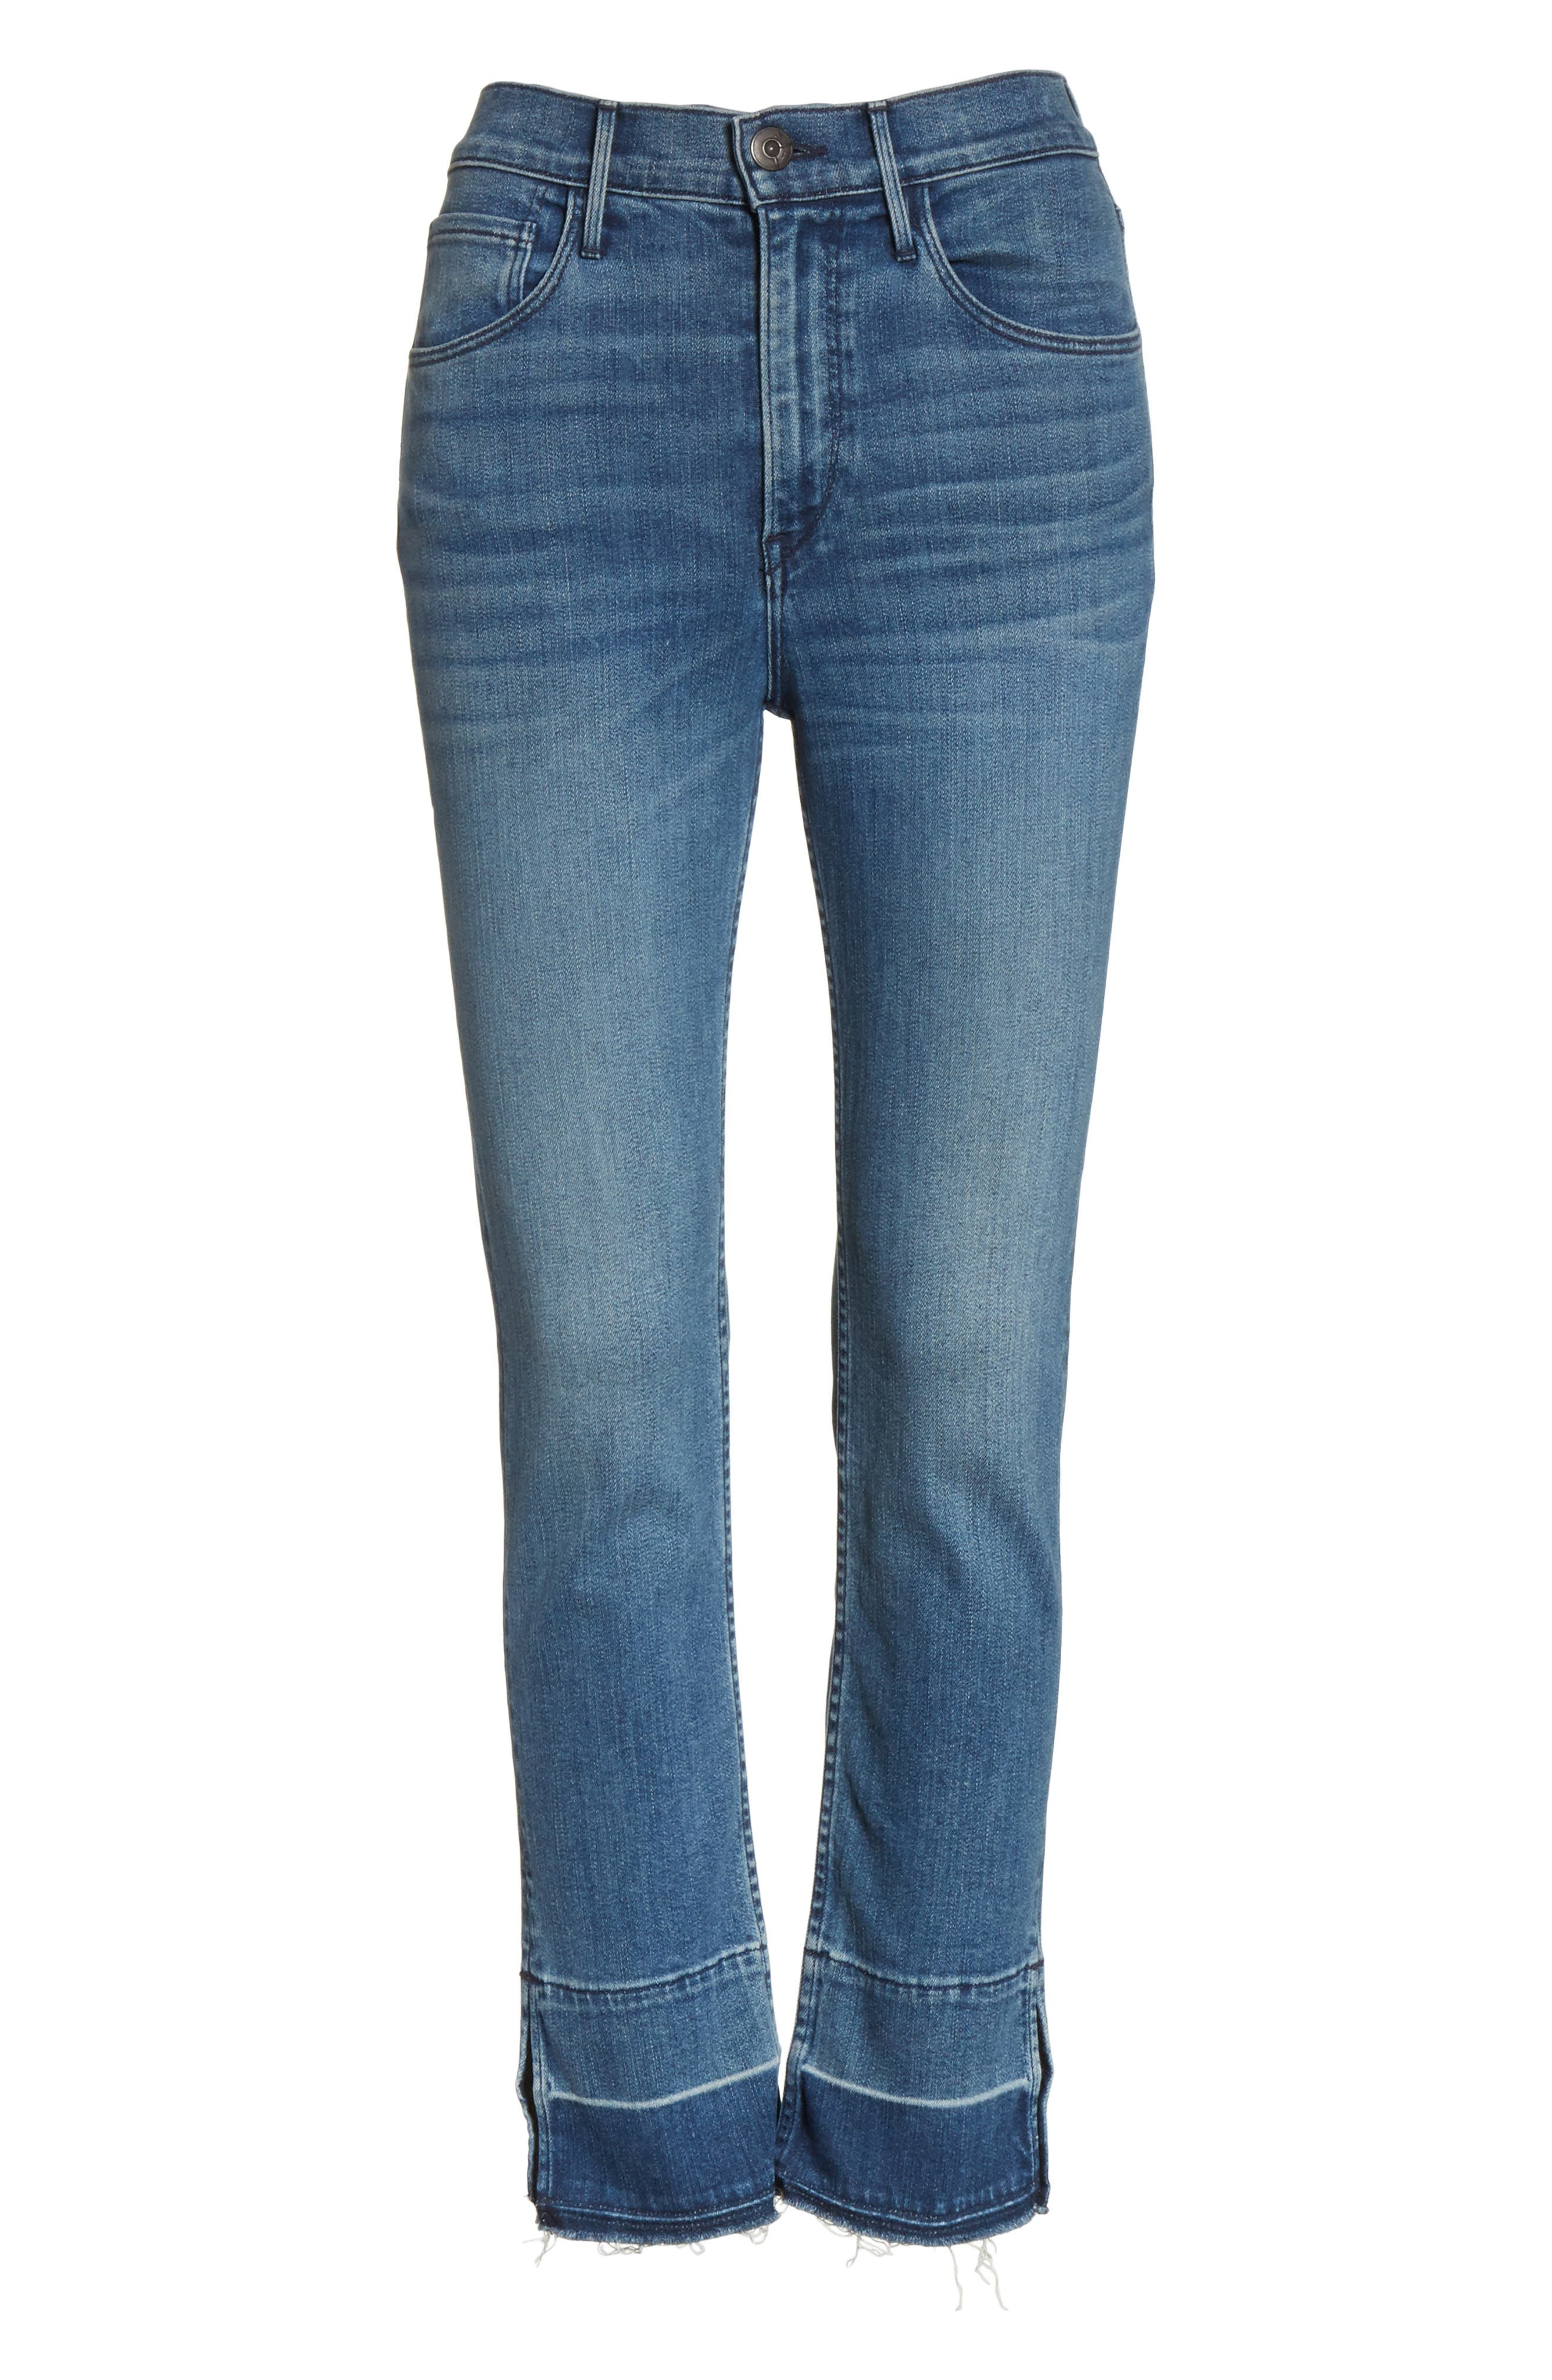 W4 Abigail Released Split Hem Ankle Skinny Jeans,                             Alternate thumbnail 6, color,                             427